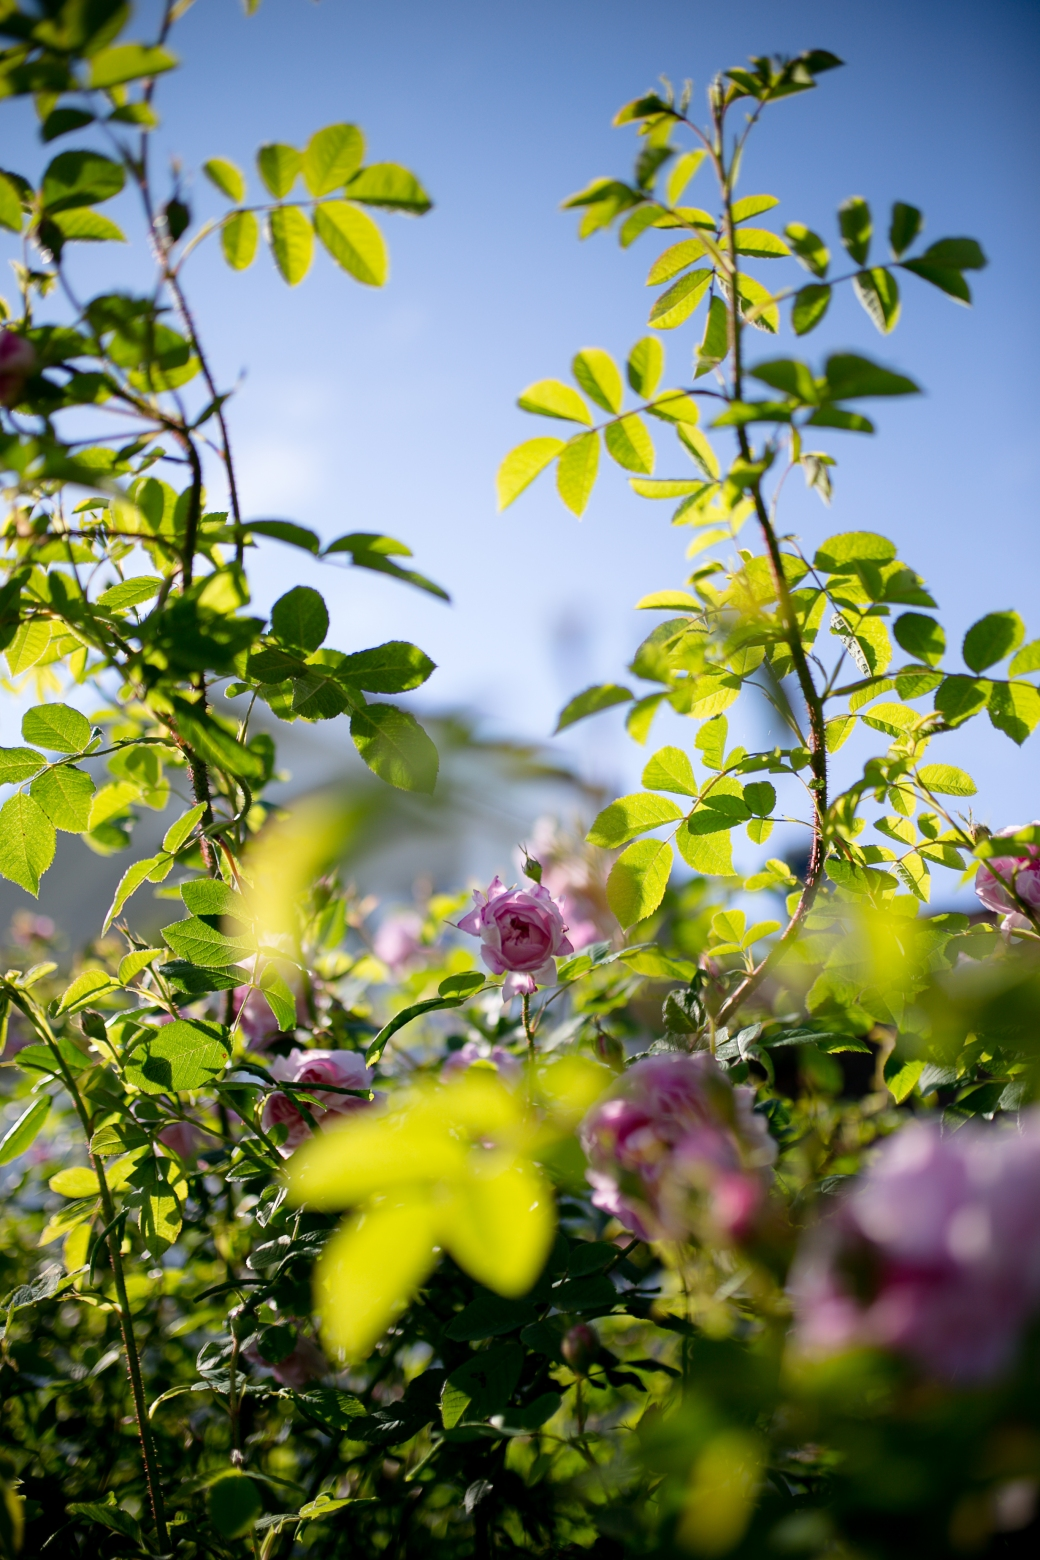 2. Stemningsbilde blomster3